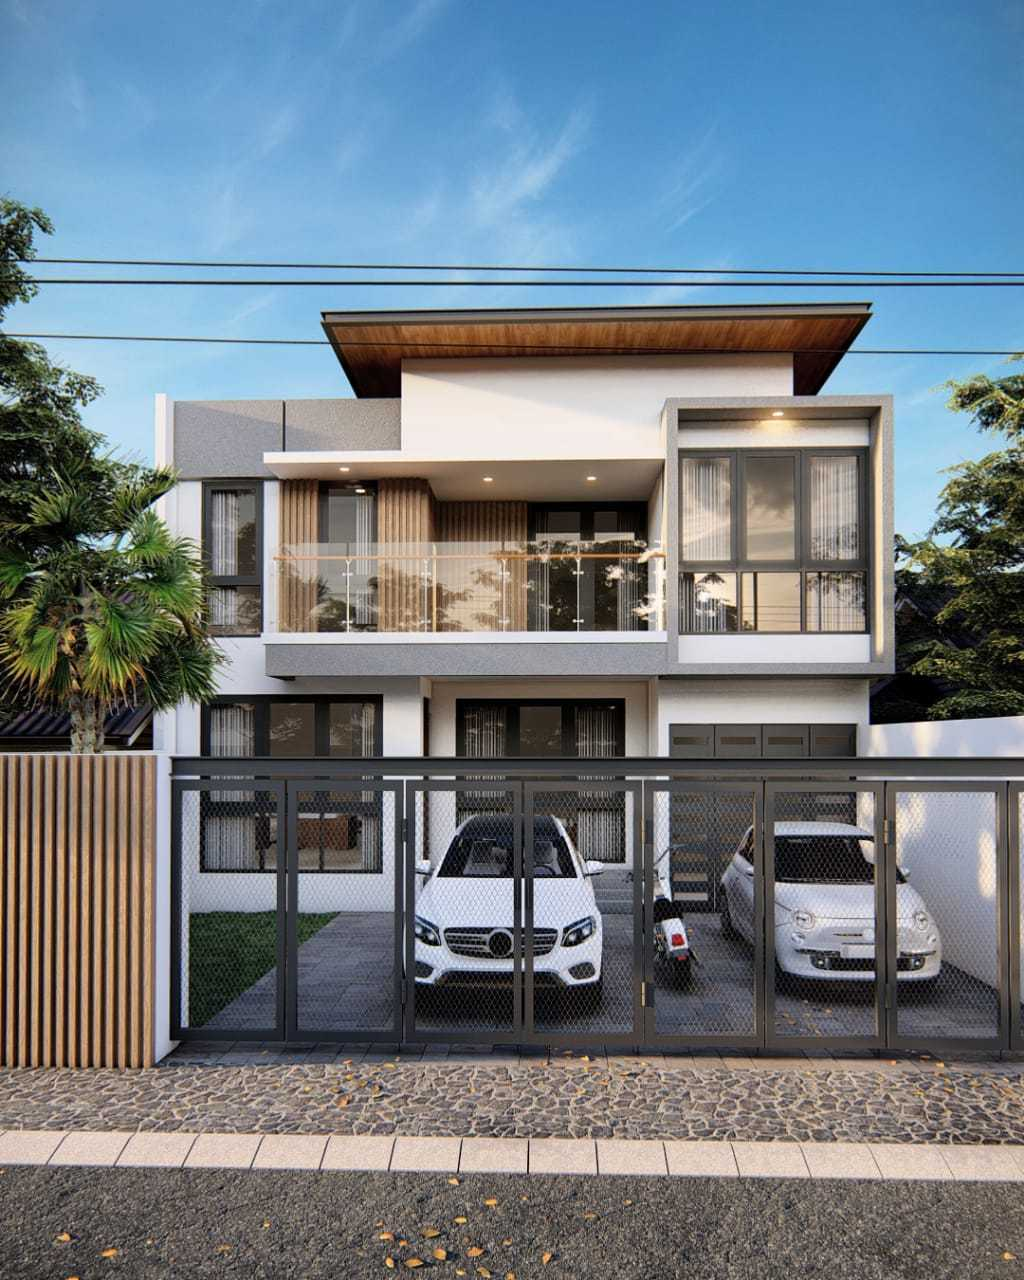 Bilikdesain Architecture Design - Bl House Jakarta Selatan, Kota Jakarta Selatan, Daerah Khusus Ibukota Jakarta, Indonesia Jakarta Selatan, Kota Jakarta Selatan, Daerah Khusus Ibukota Jakarta, Indonesia Bilikdesain-Architecture-Design-Bl-House  110567